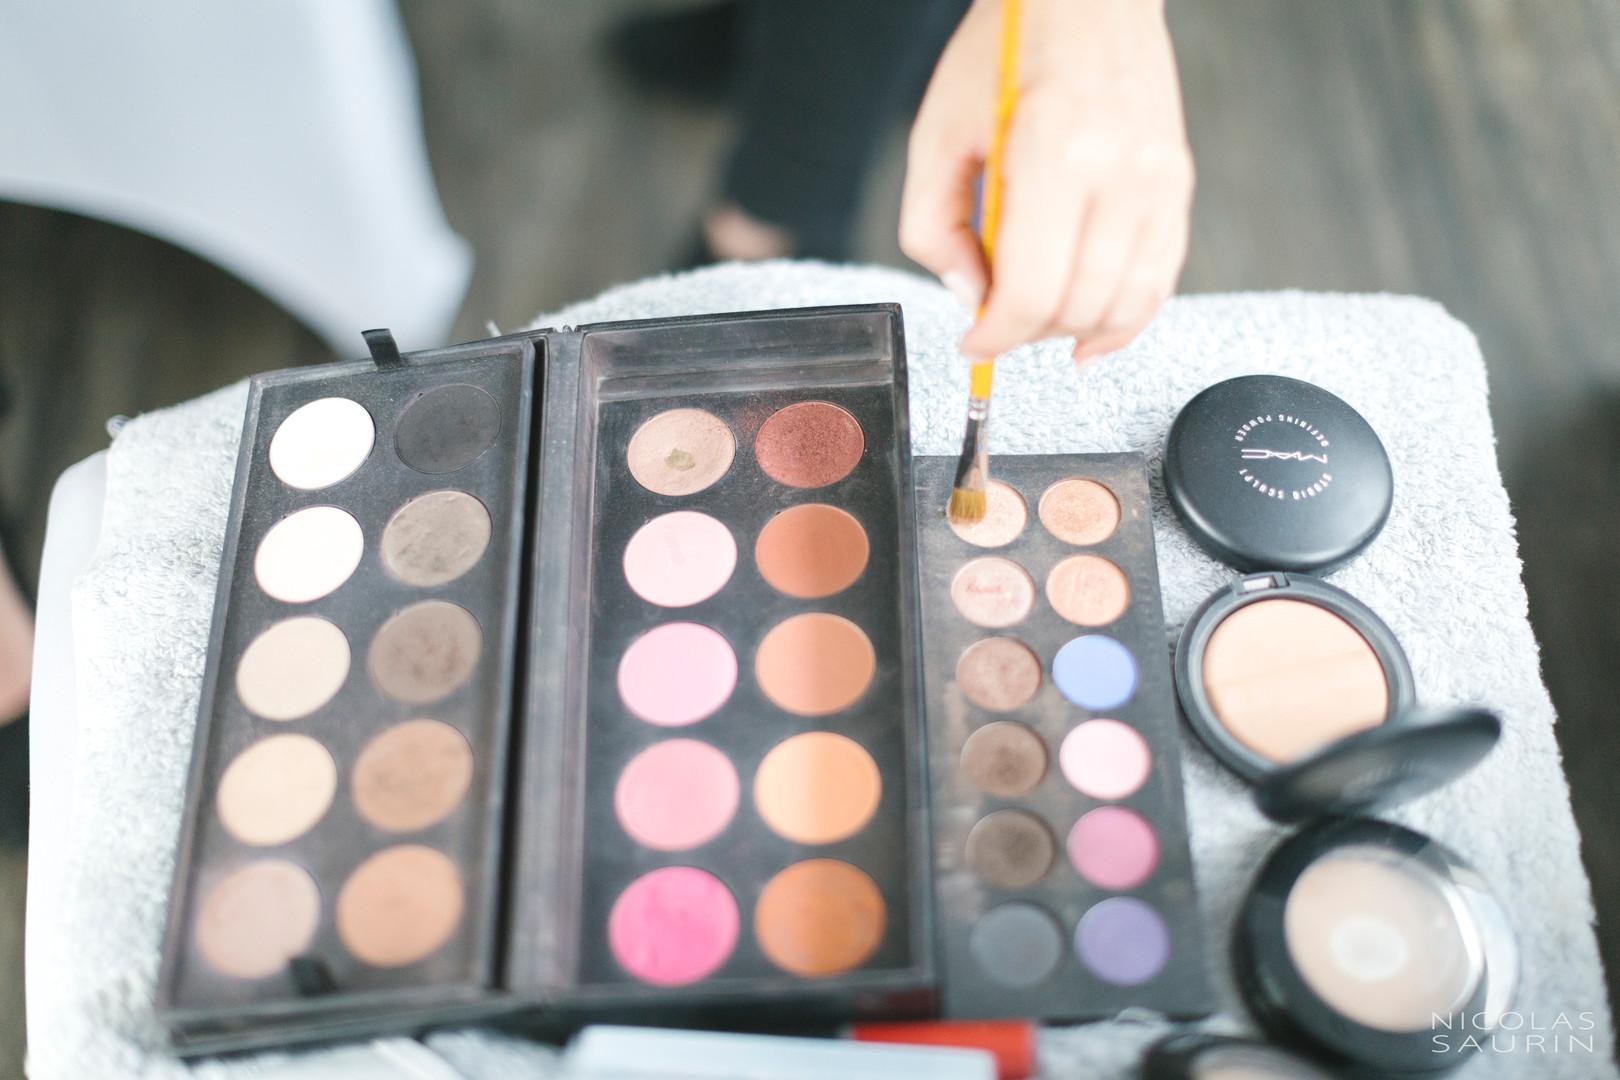 Maquillage Mac et Make up forever